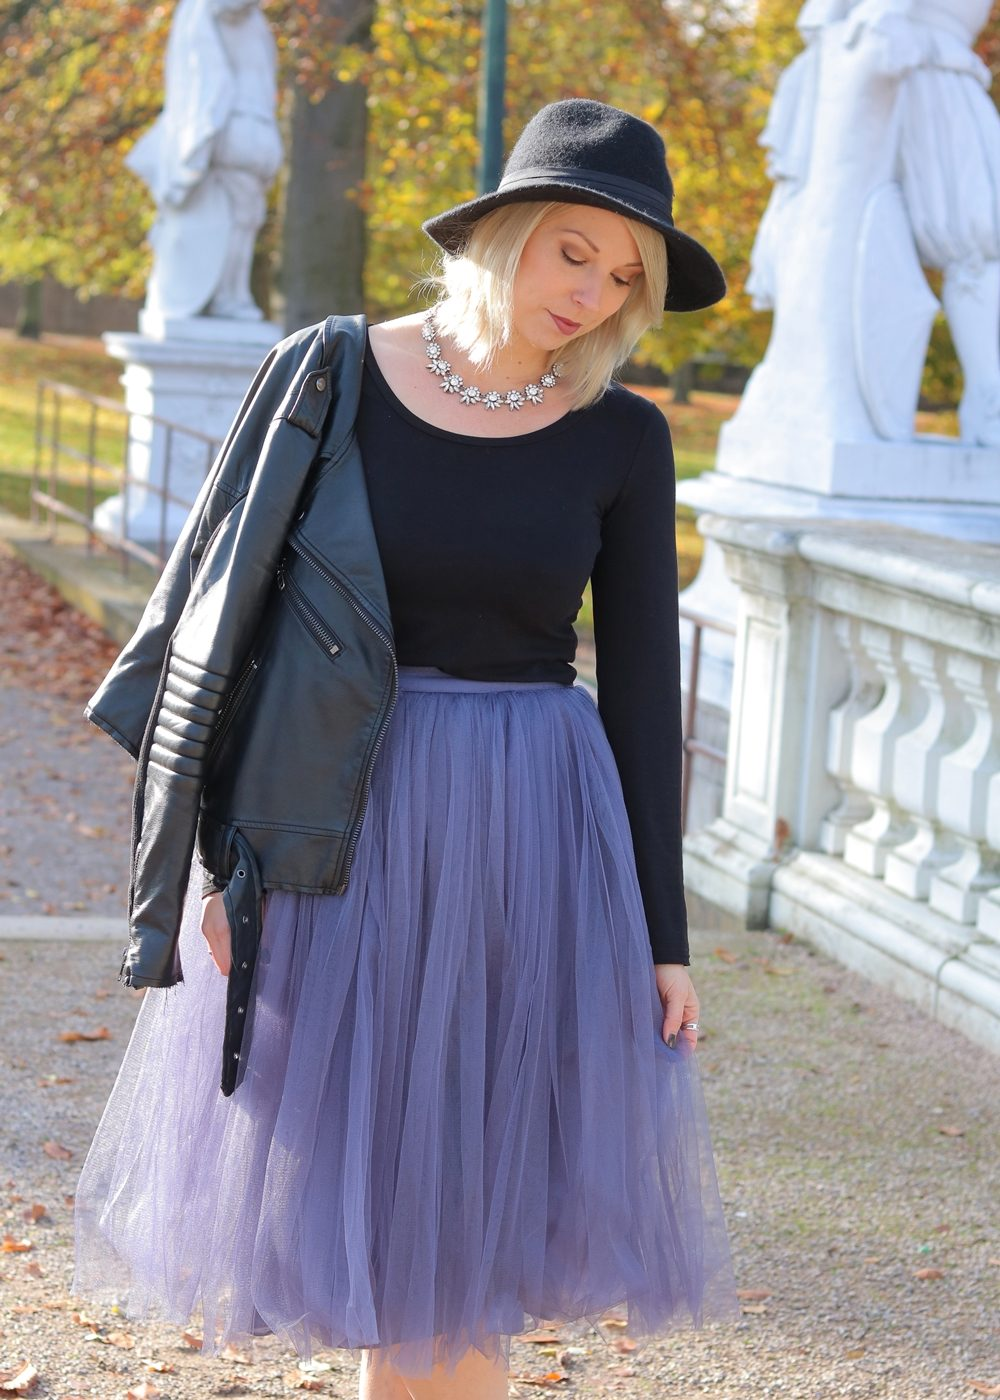 fashionblogger-karlsruhe-outfit-lila-tuellrock-asos-shirt-pumps-tamaris-schwarzer-hut-12